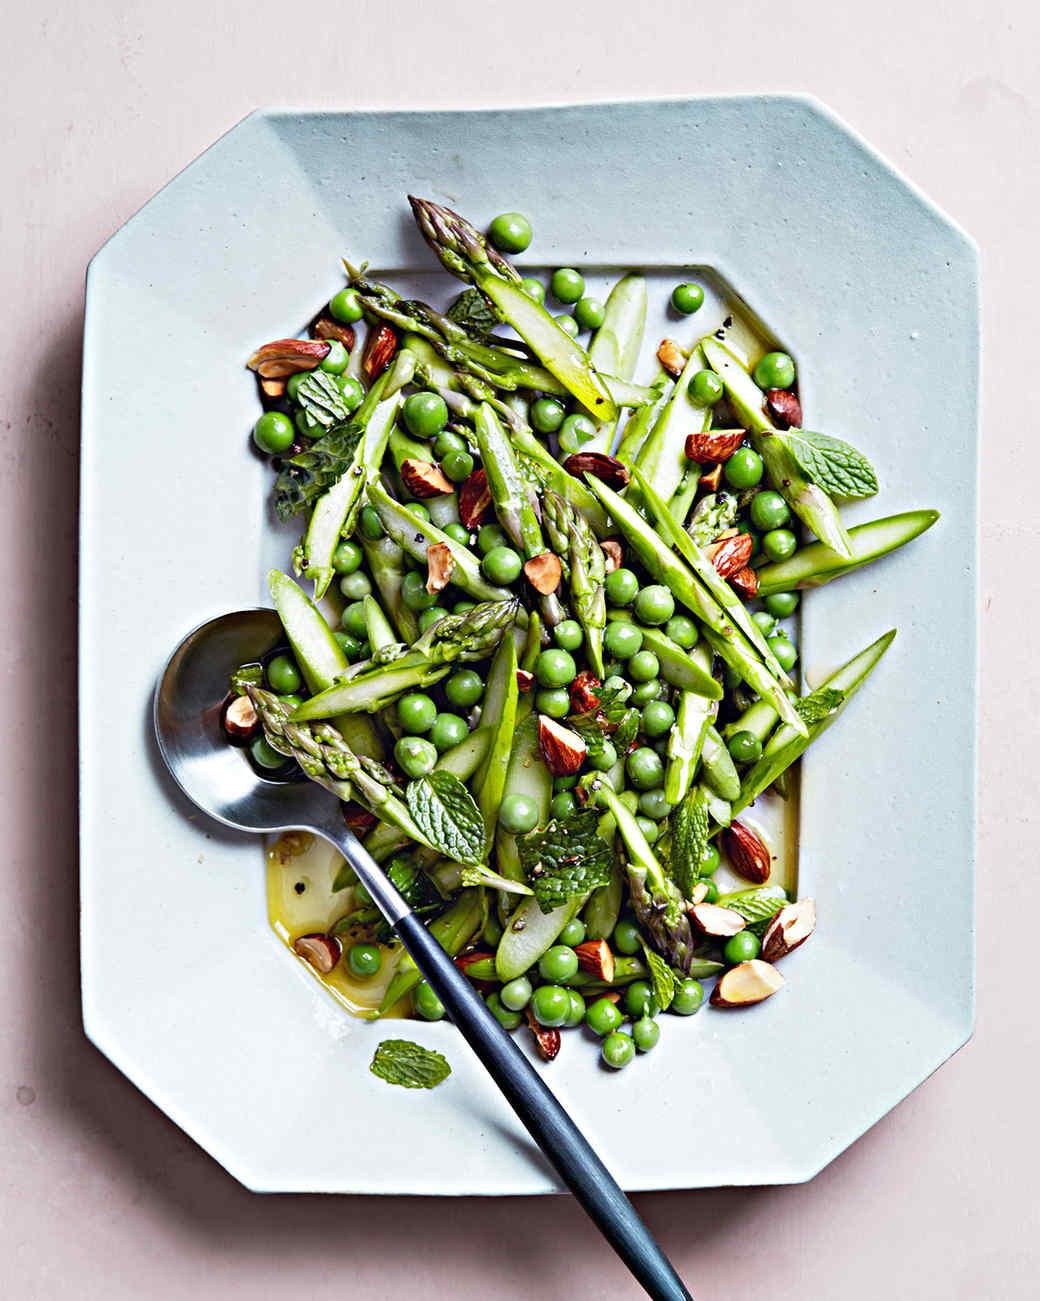 pea and asparagus salad